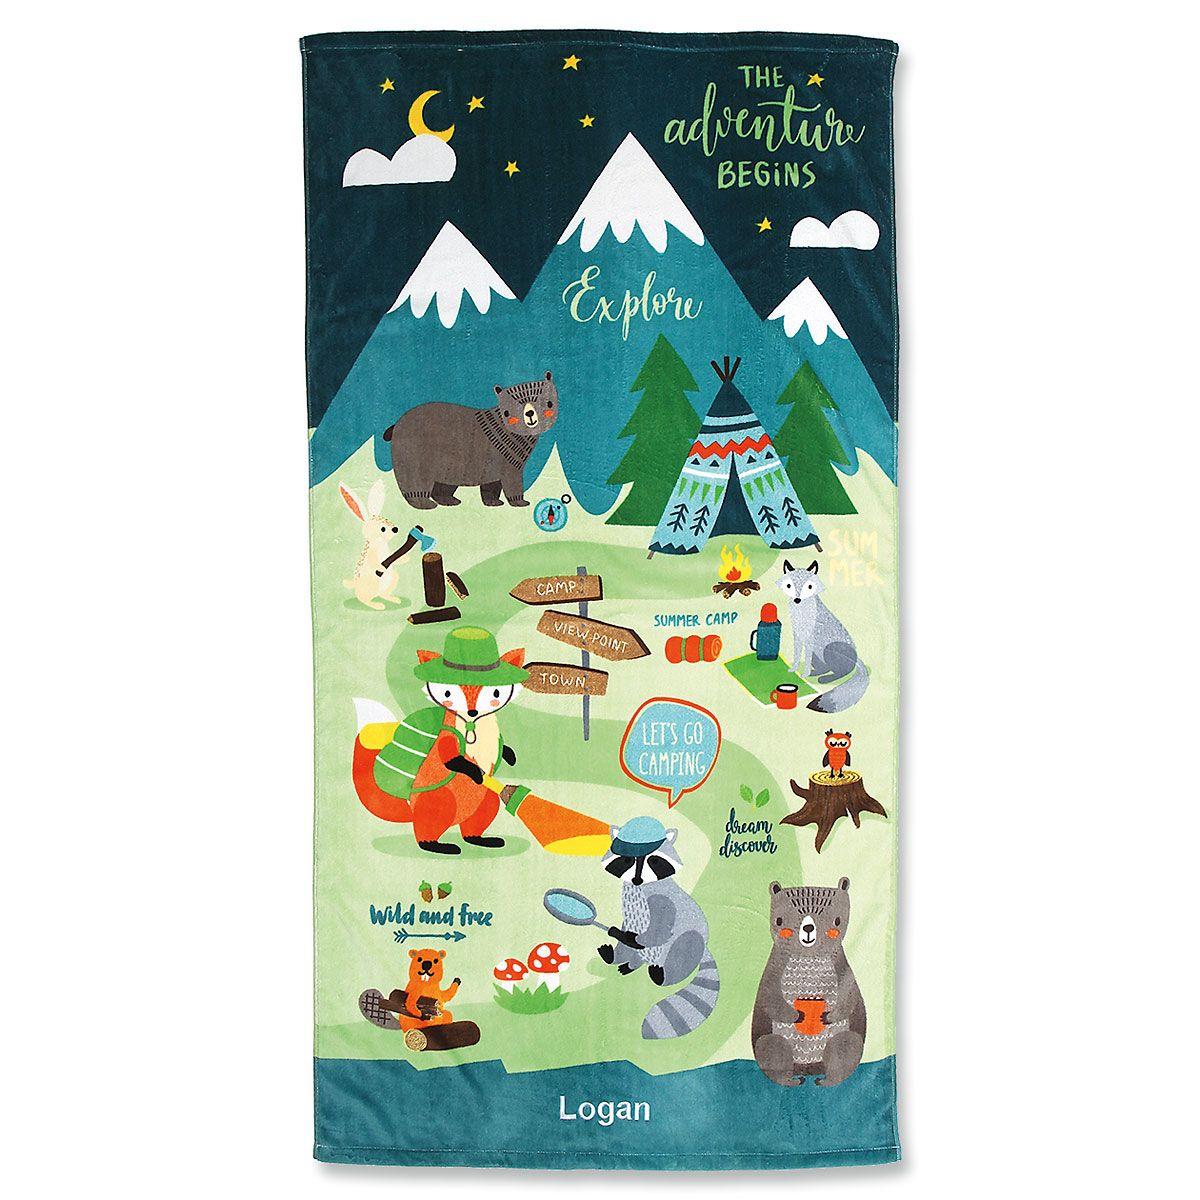 Woodland Animals Personalized Towel